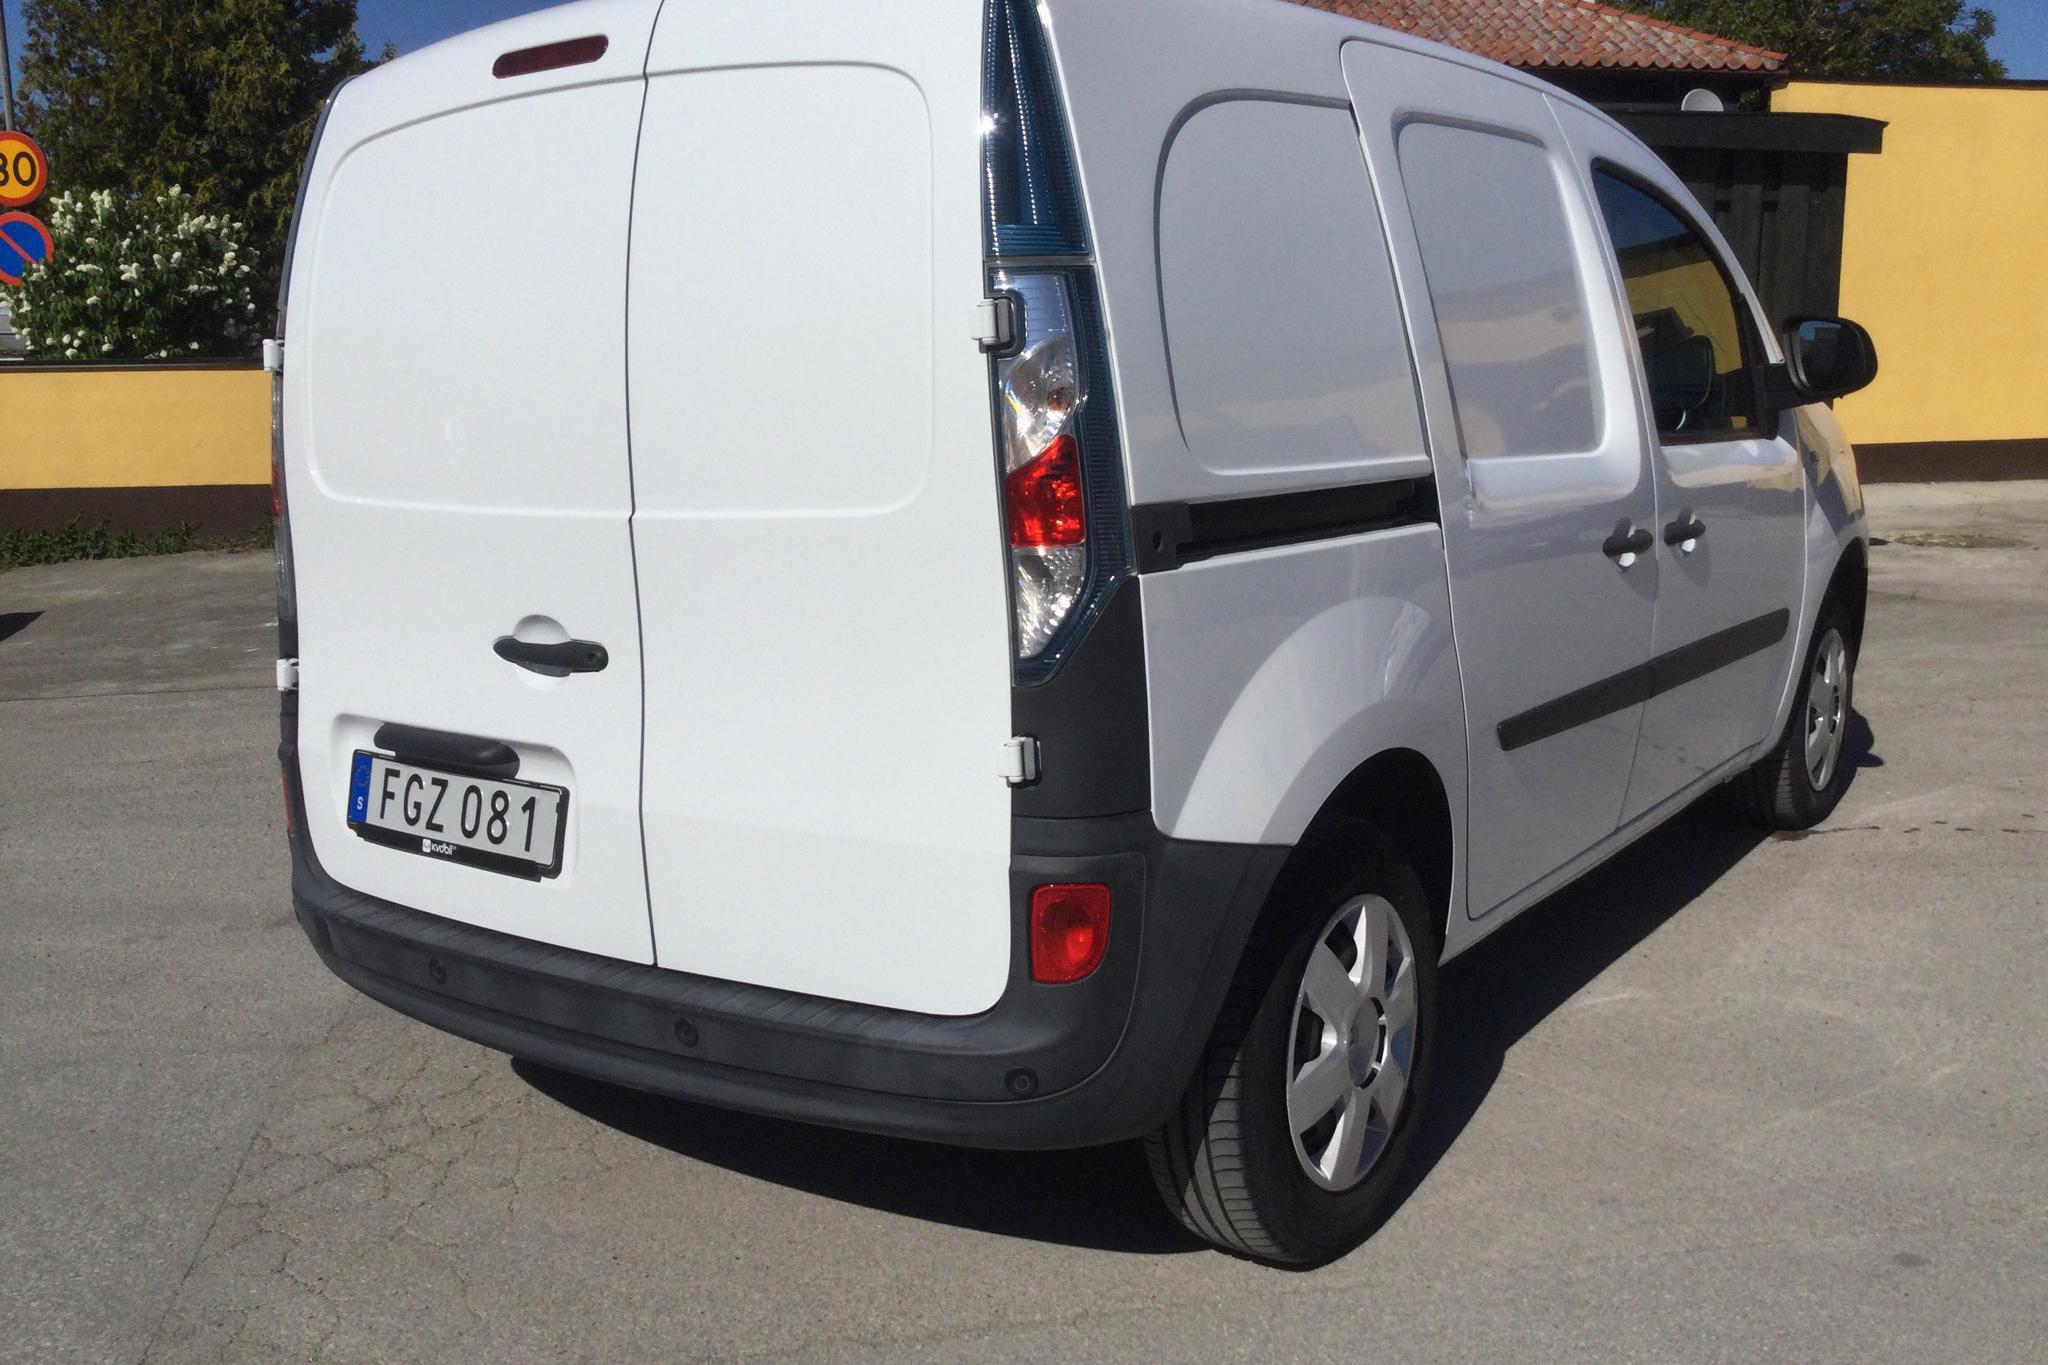 Renault Kangoo II Z.E. 22 kWh Skåp (60hk) - 12 580 km - Automatic - white - 2014